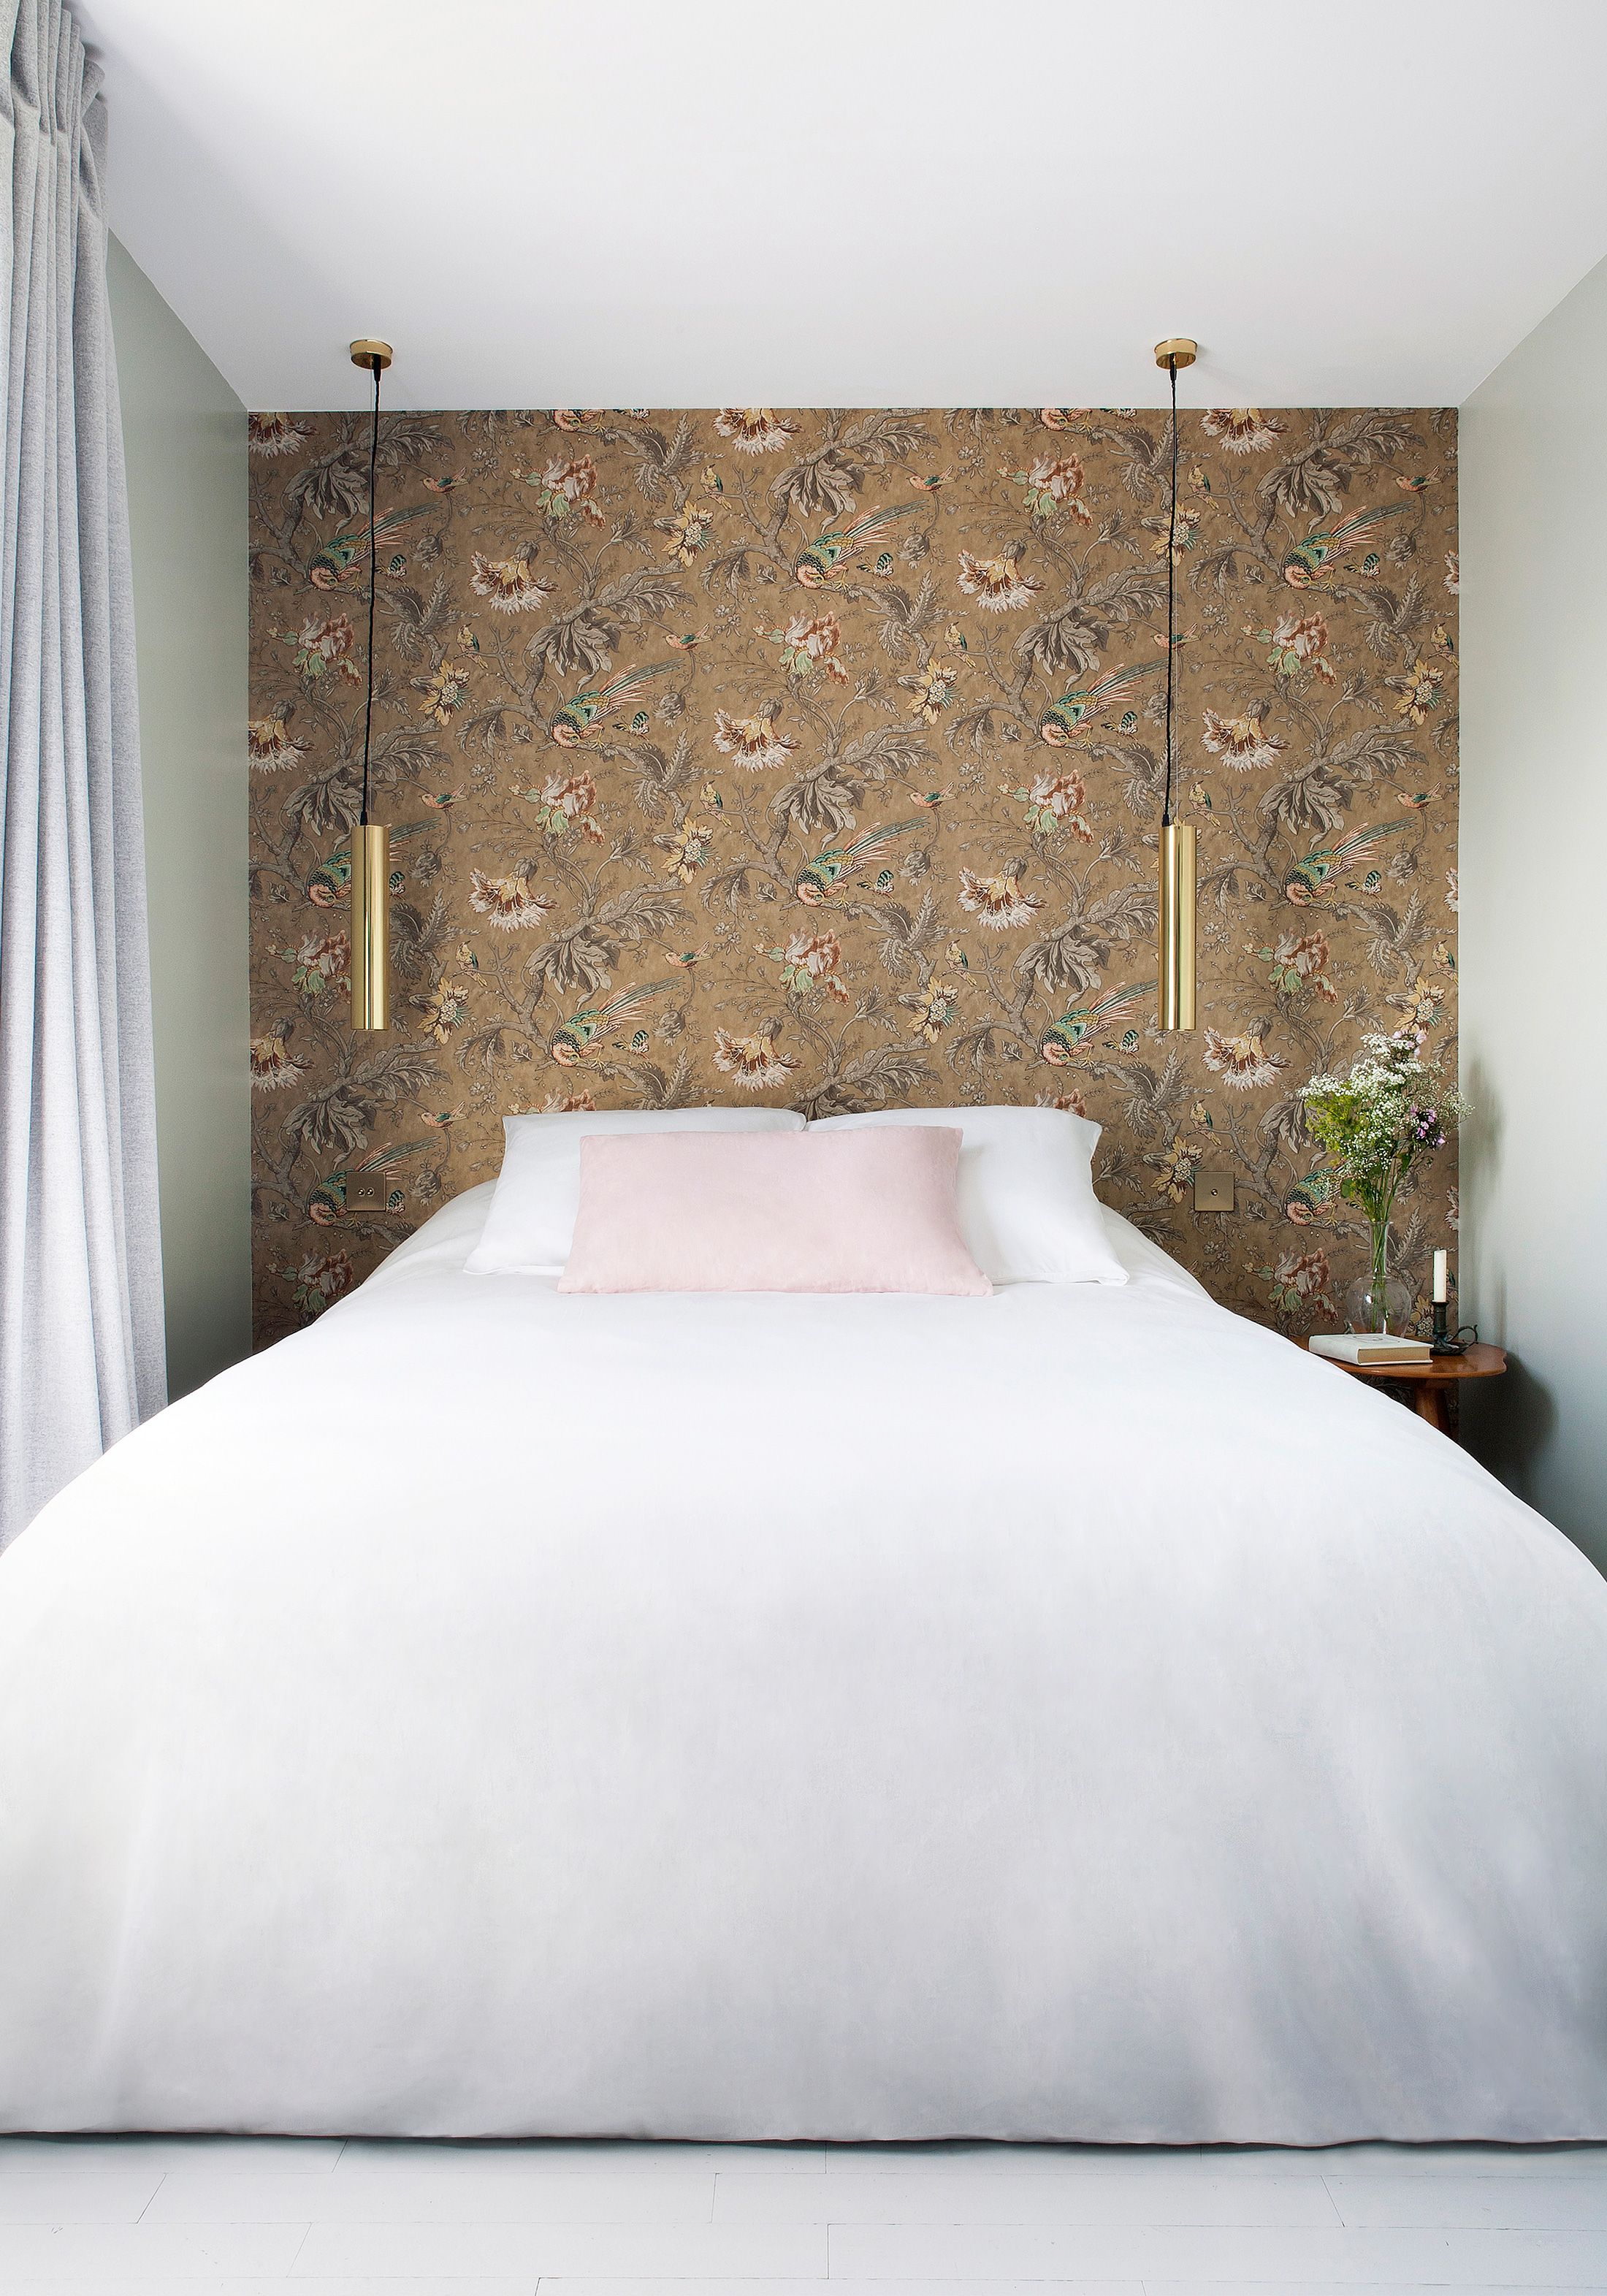 ARCHITECTURAL DESIGN PALE YELLOW BACKROUND Wallpaper bordeR Wall Decor